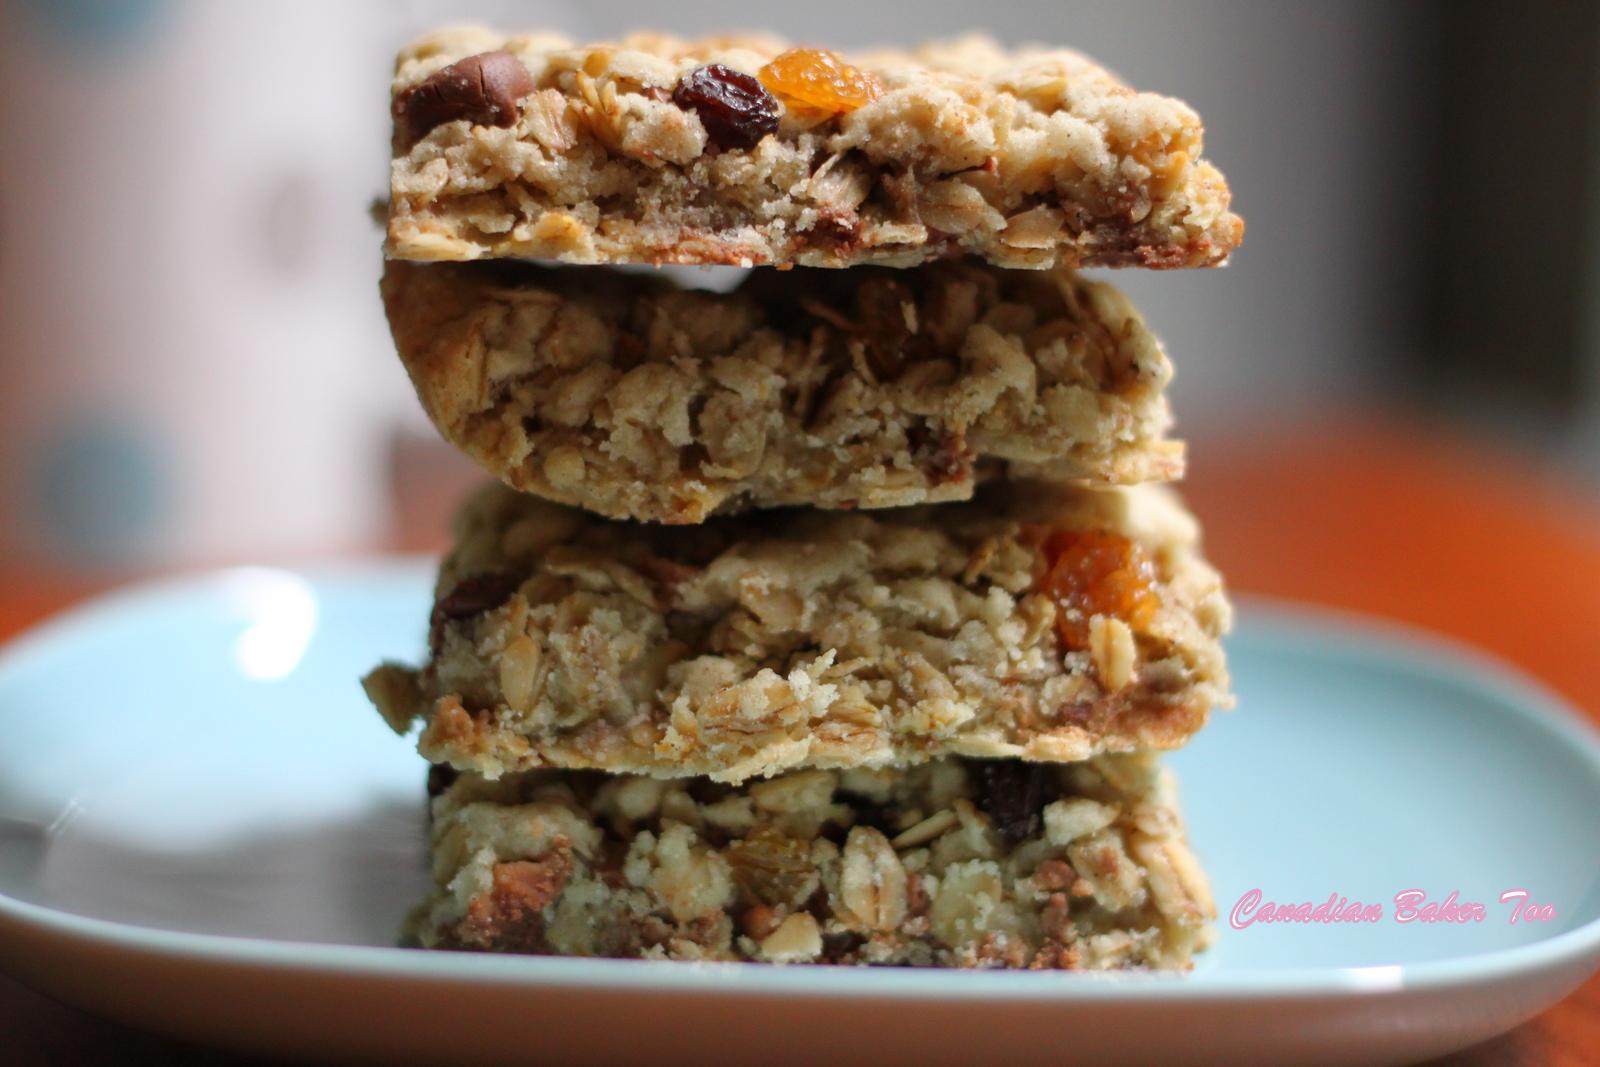 Canadian Baker Too: Oatmeal Bars